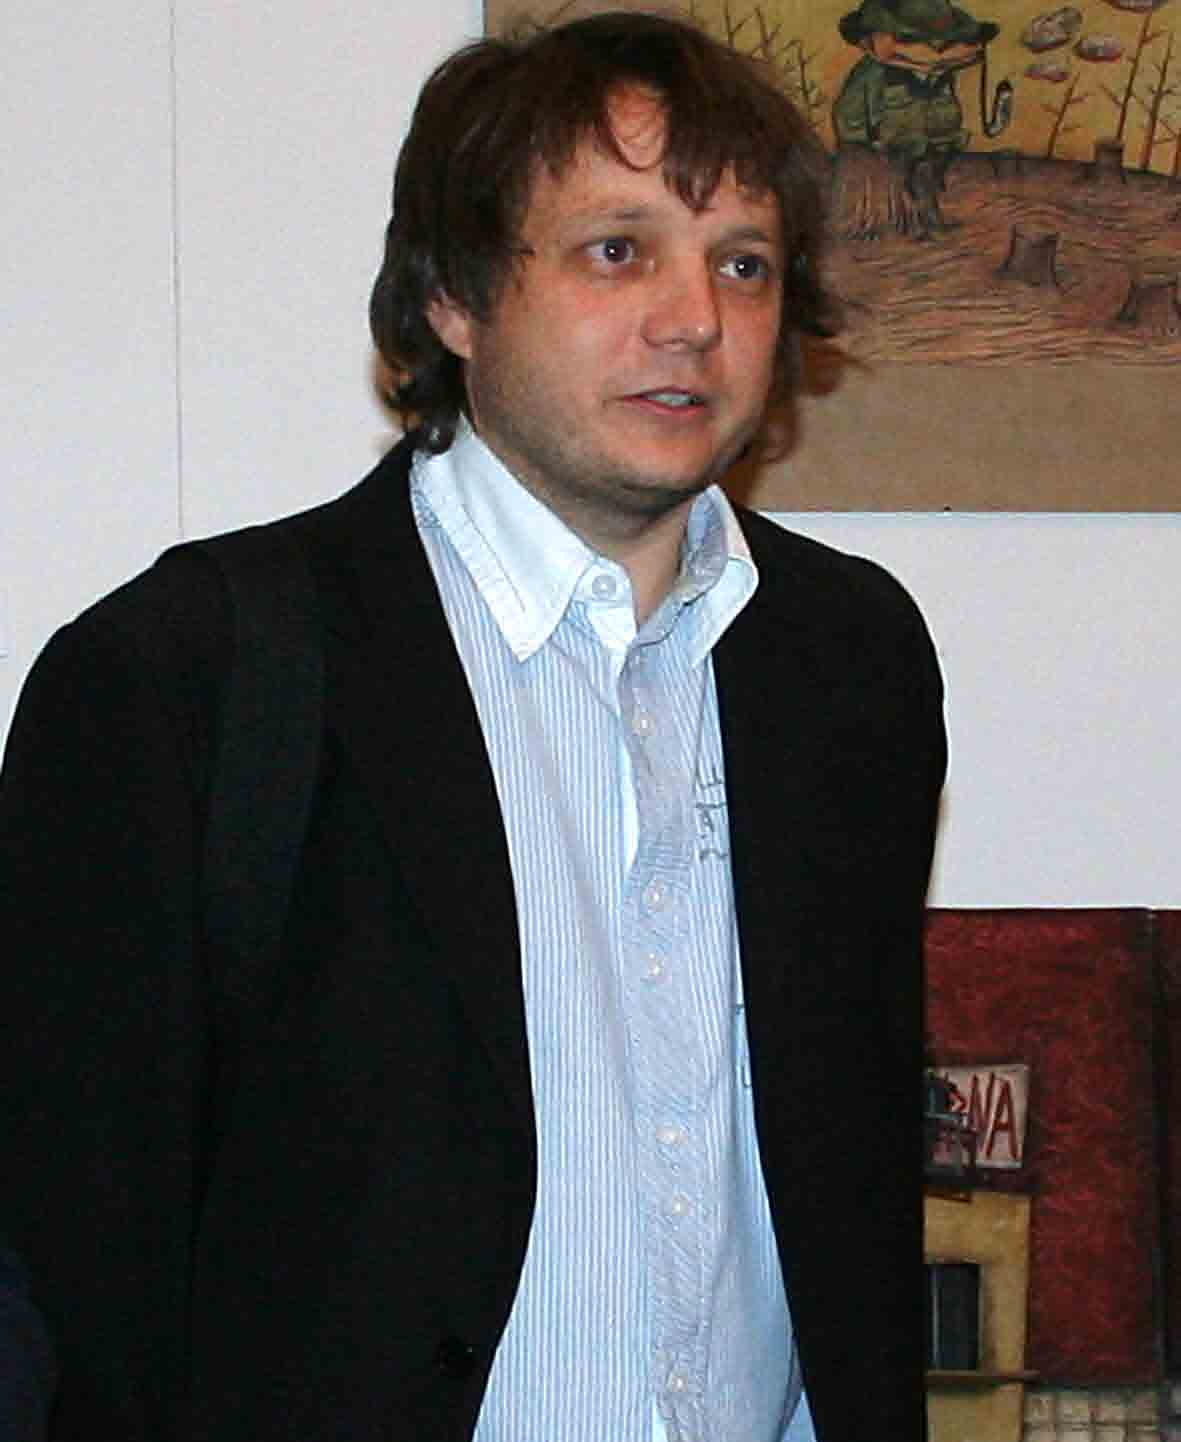 Martin Vandas